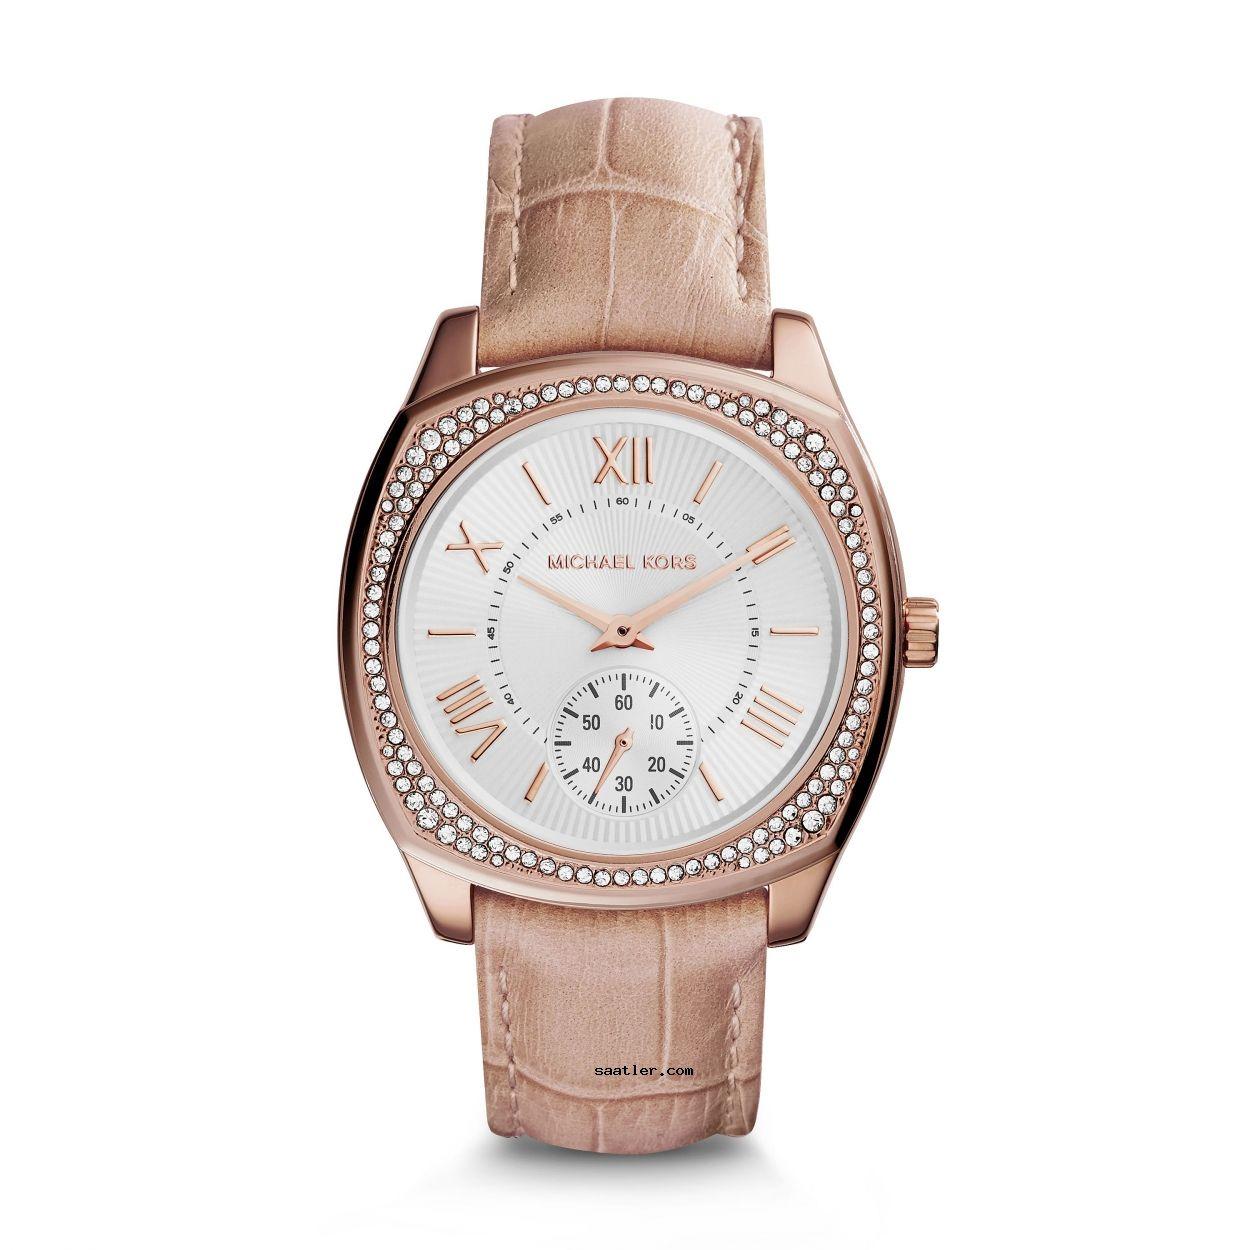 Michael Kors Mk2388 Bayan Kol Saati Leather Watch Michael Kors Leather